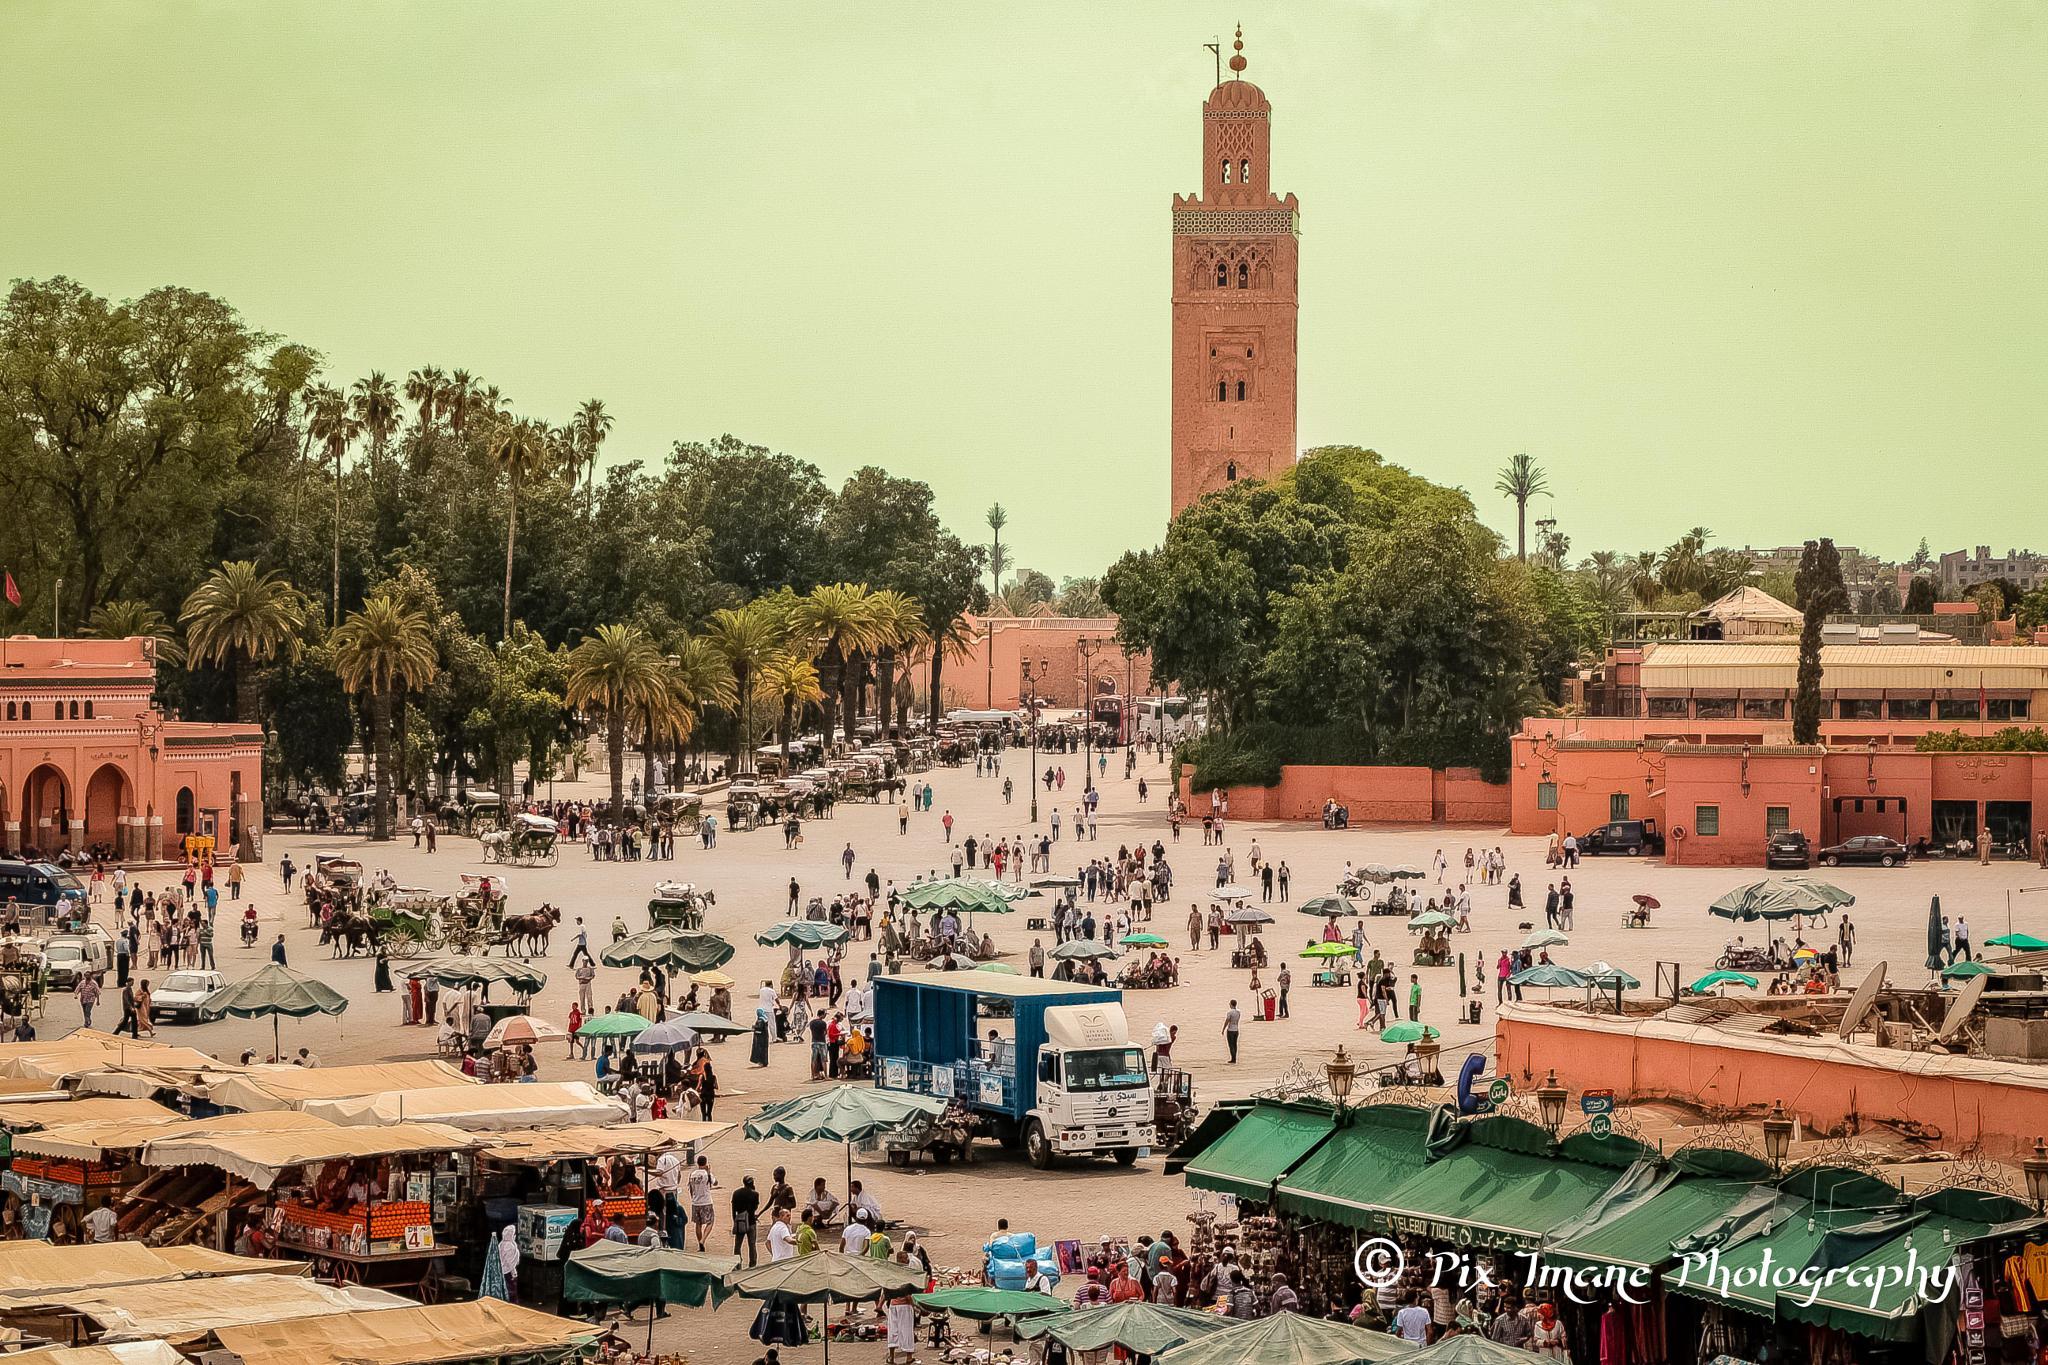 Djemaa el Fna - Marrakech - Morocco by PixImane Photography